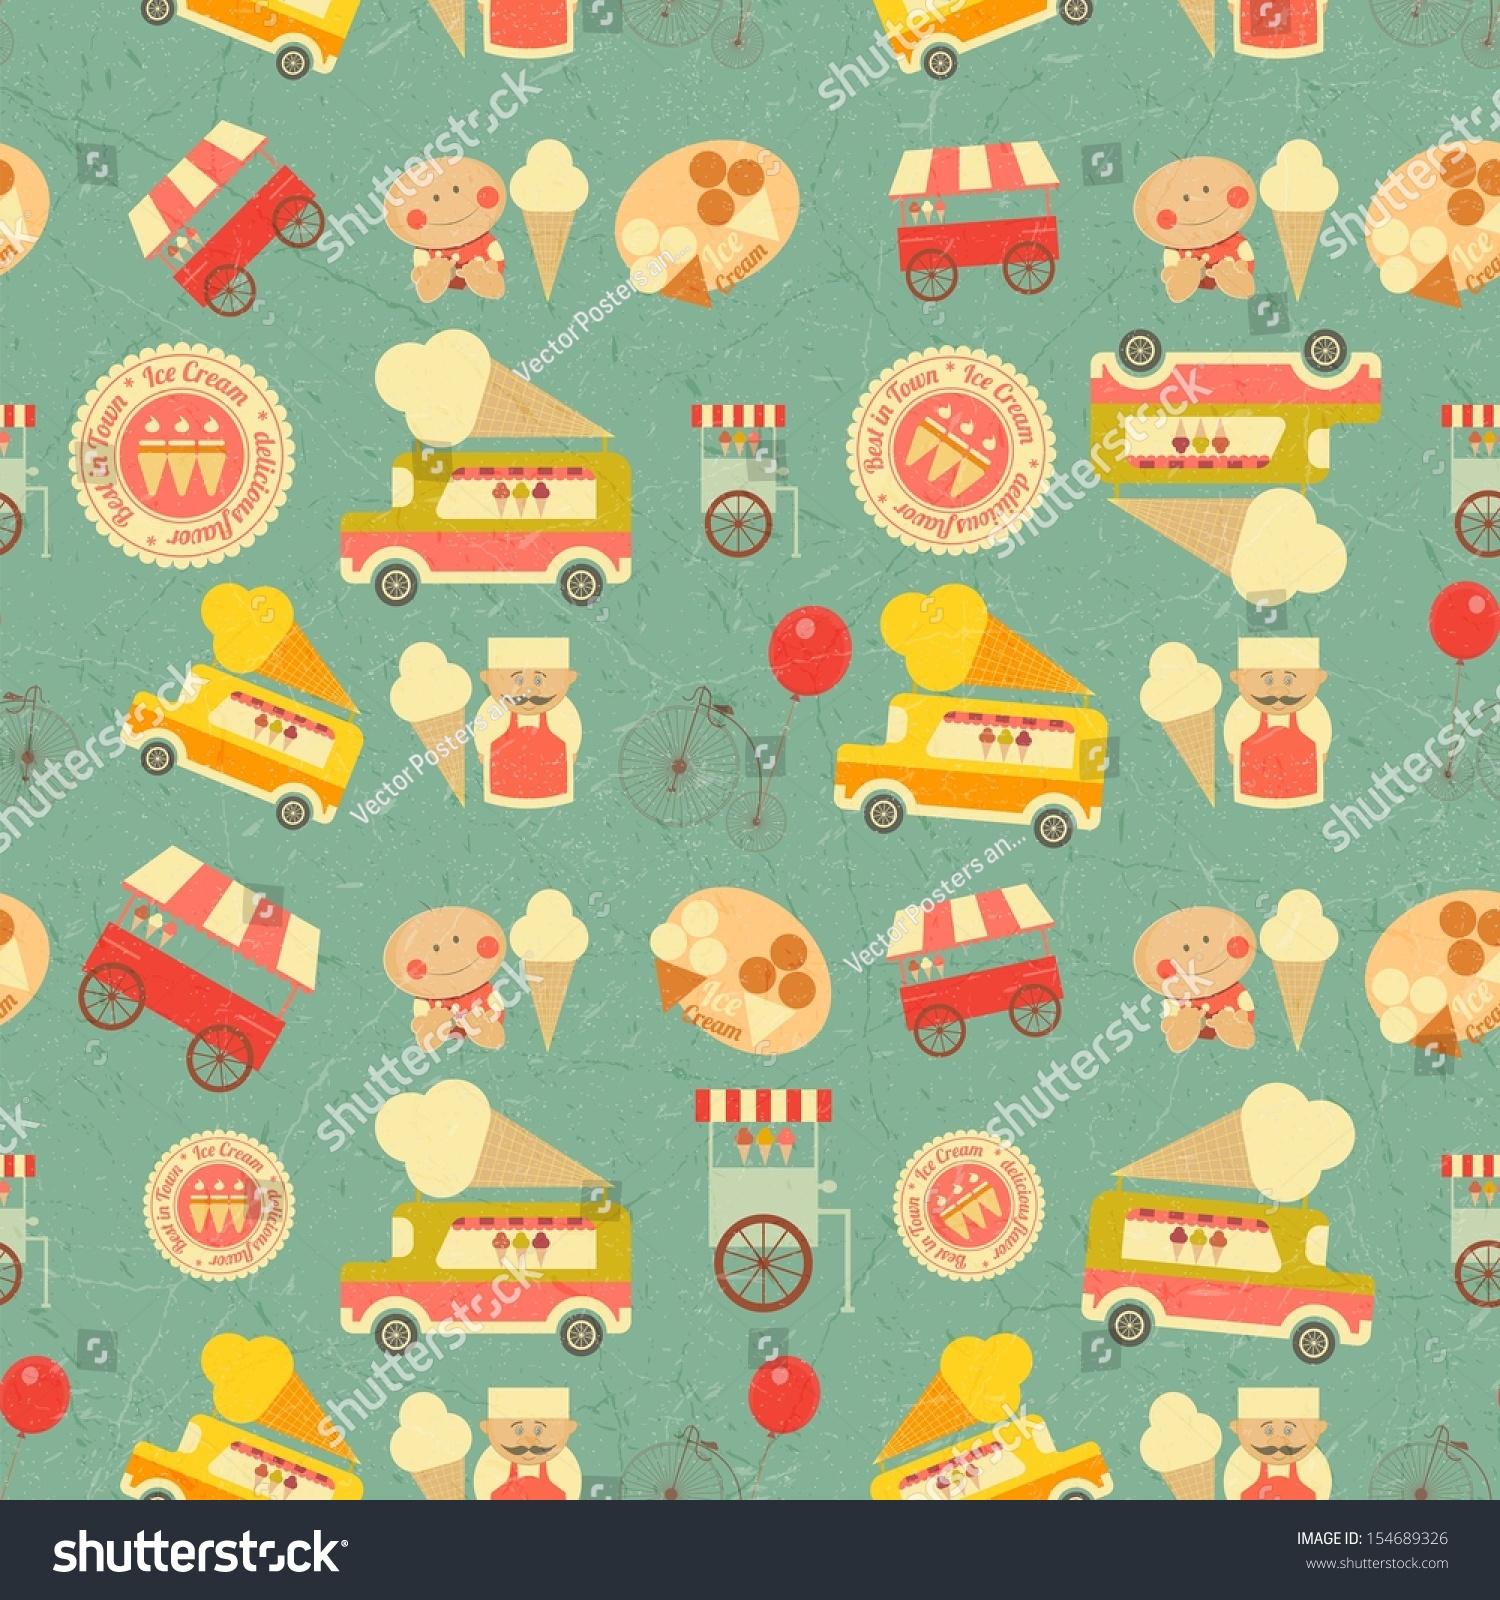 Seamless Ice Cream Background Vintage Style: Ice Cream Dessert Vintage Seamless Background In Retro